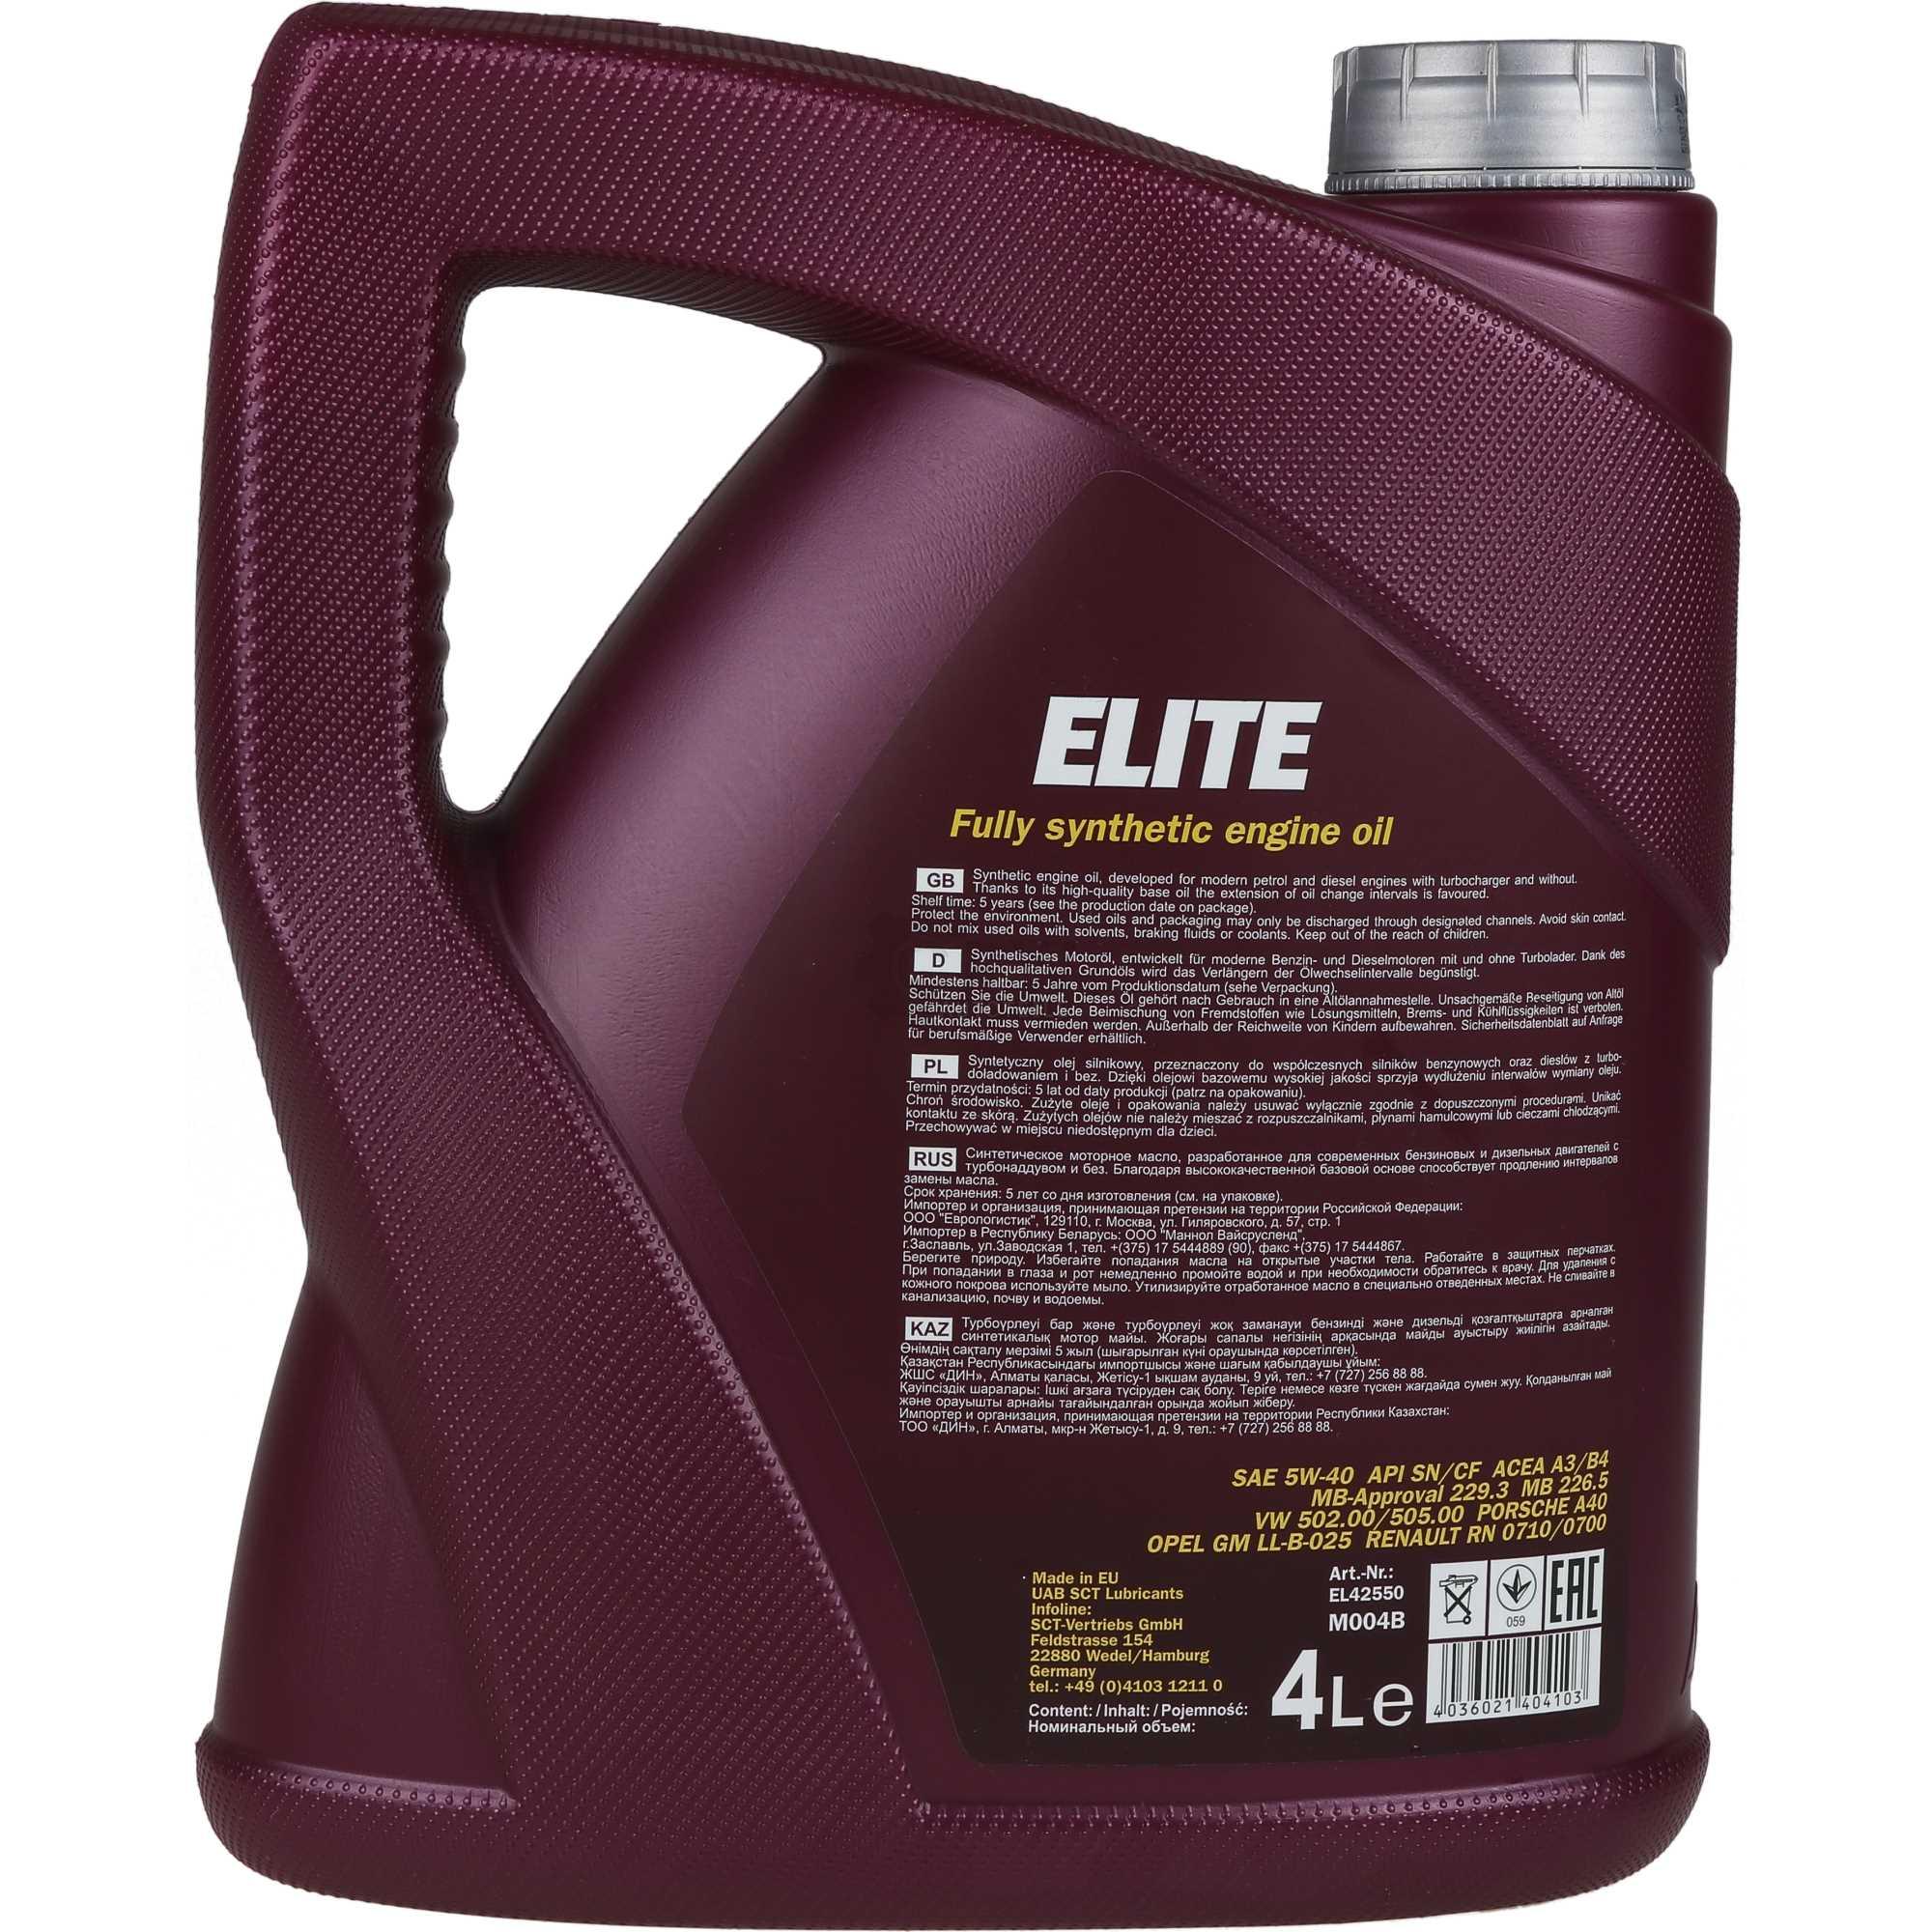 Aceite-del-motor-aceite-5w40-10w40-15w40-5w30-10w60-1l-4l-5l-7l-10l-20l miniatura 24